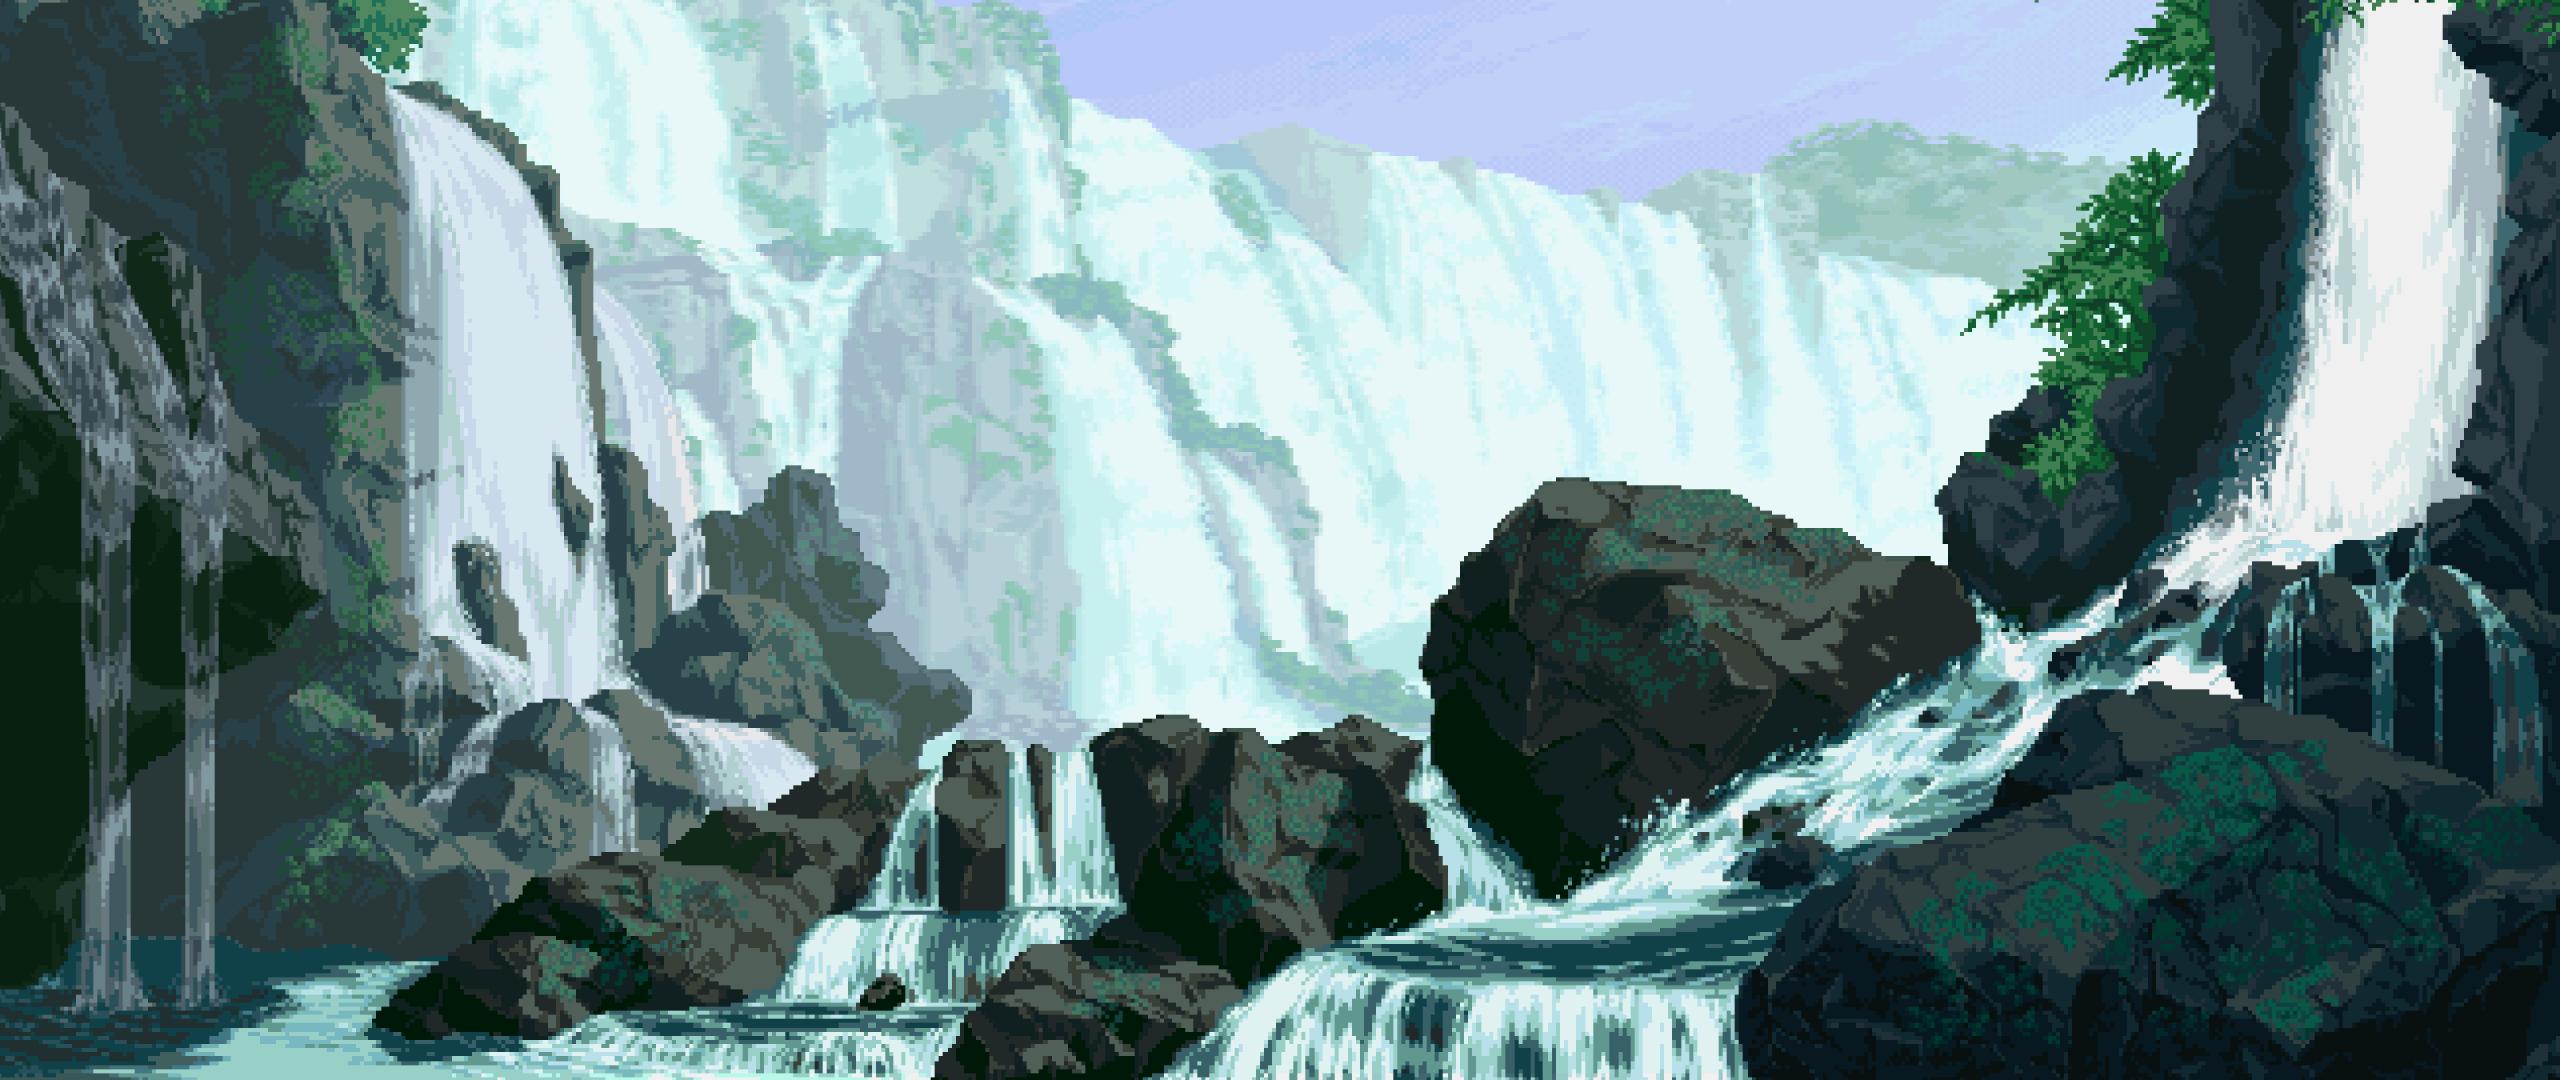 Pixel Art Wallpaper Sf Wallpaper